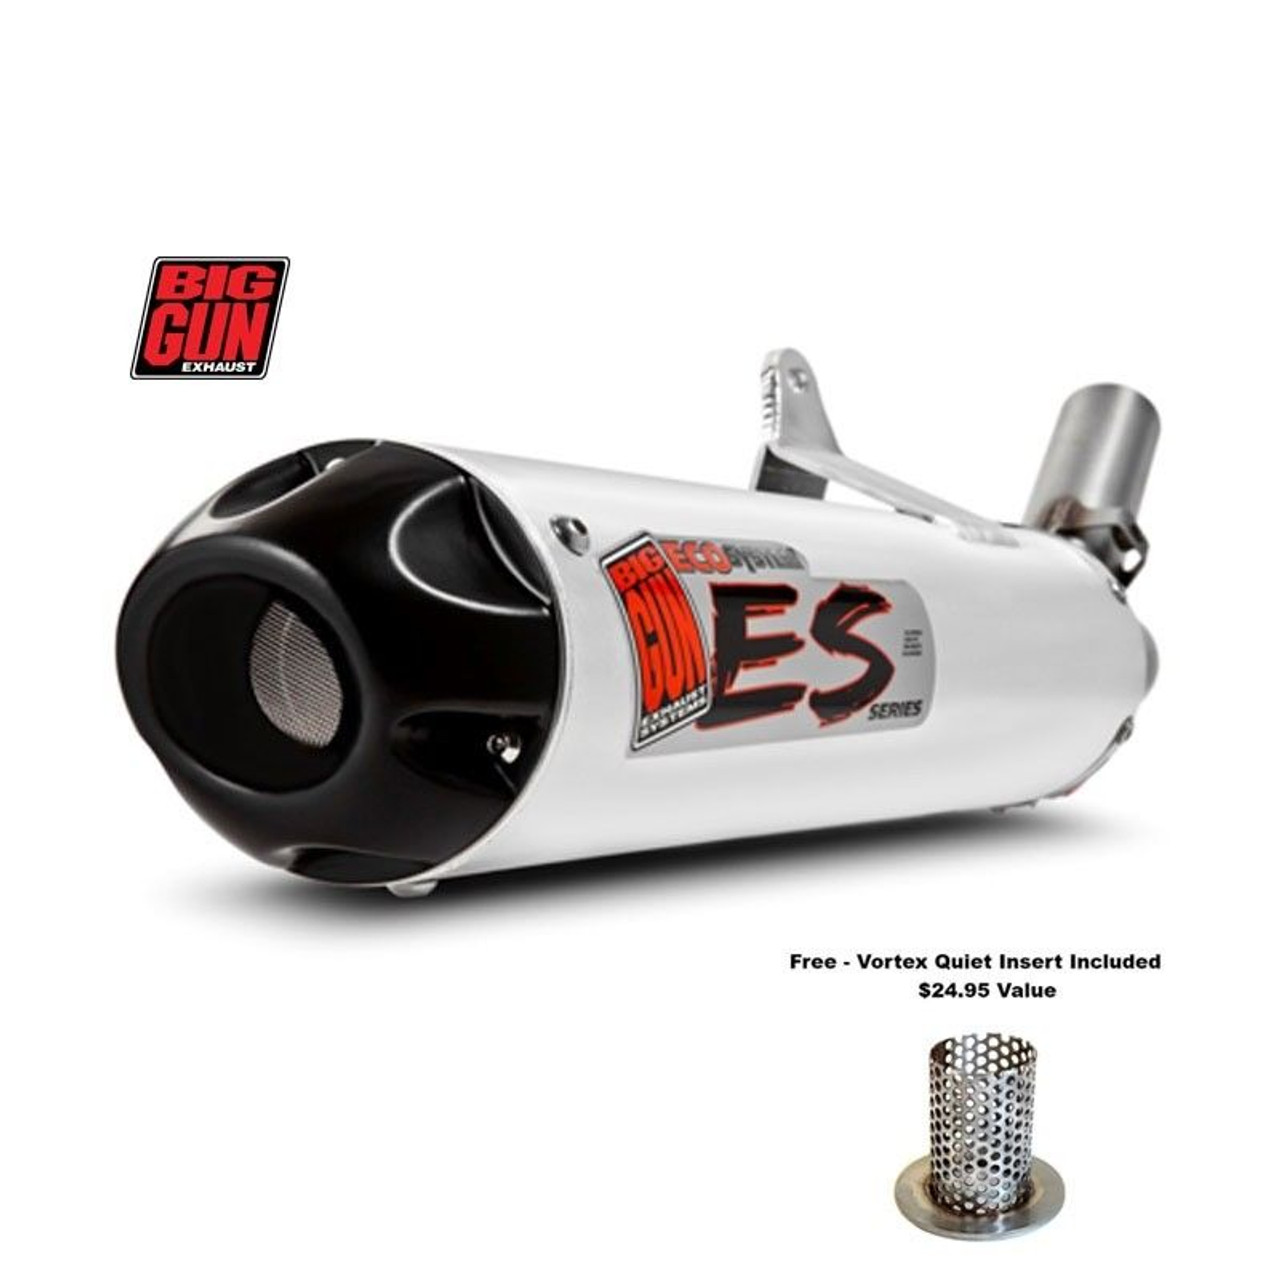 Trx450r Trx450 Trx 450 Big Gun Exhaust Eco Slip On Muffler Pipe 06-14  07-1132